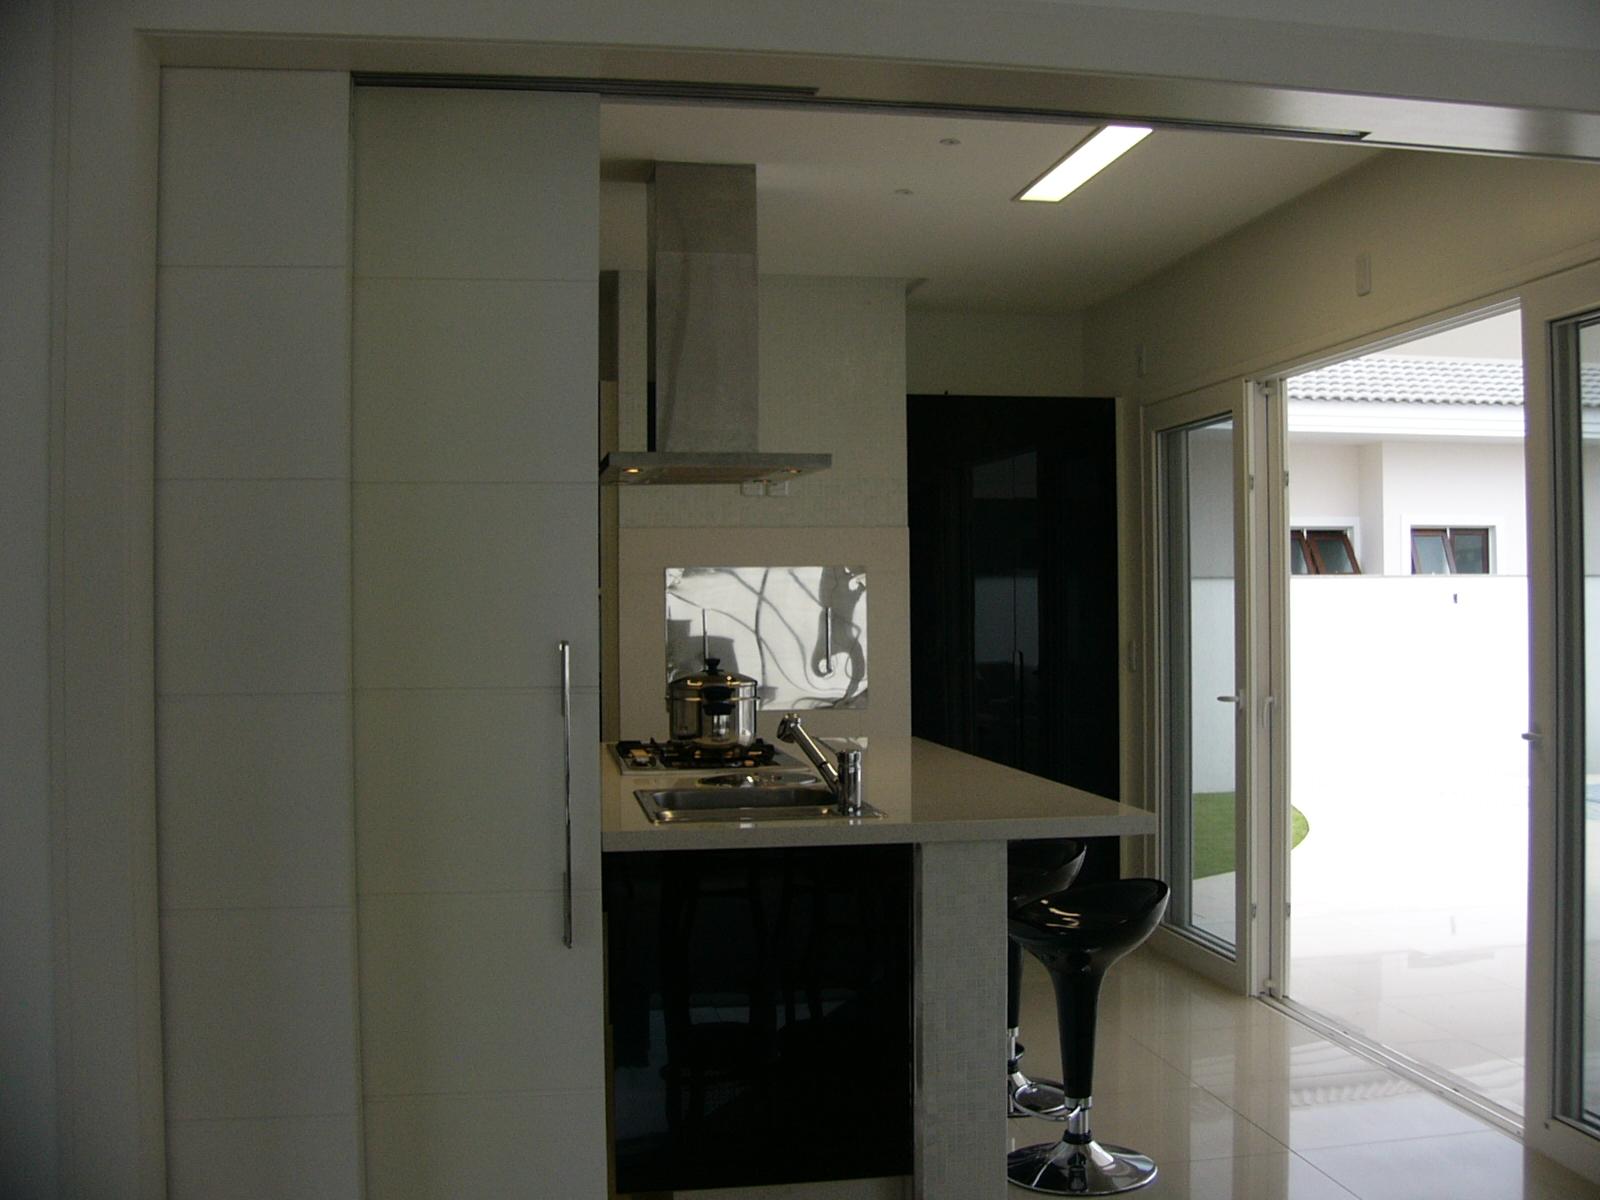 #575343 Nenhuma janela nesta cozinha . Invés disto uma ampla porta janela  42 Janelas De Vidro Cozinha